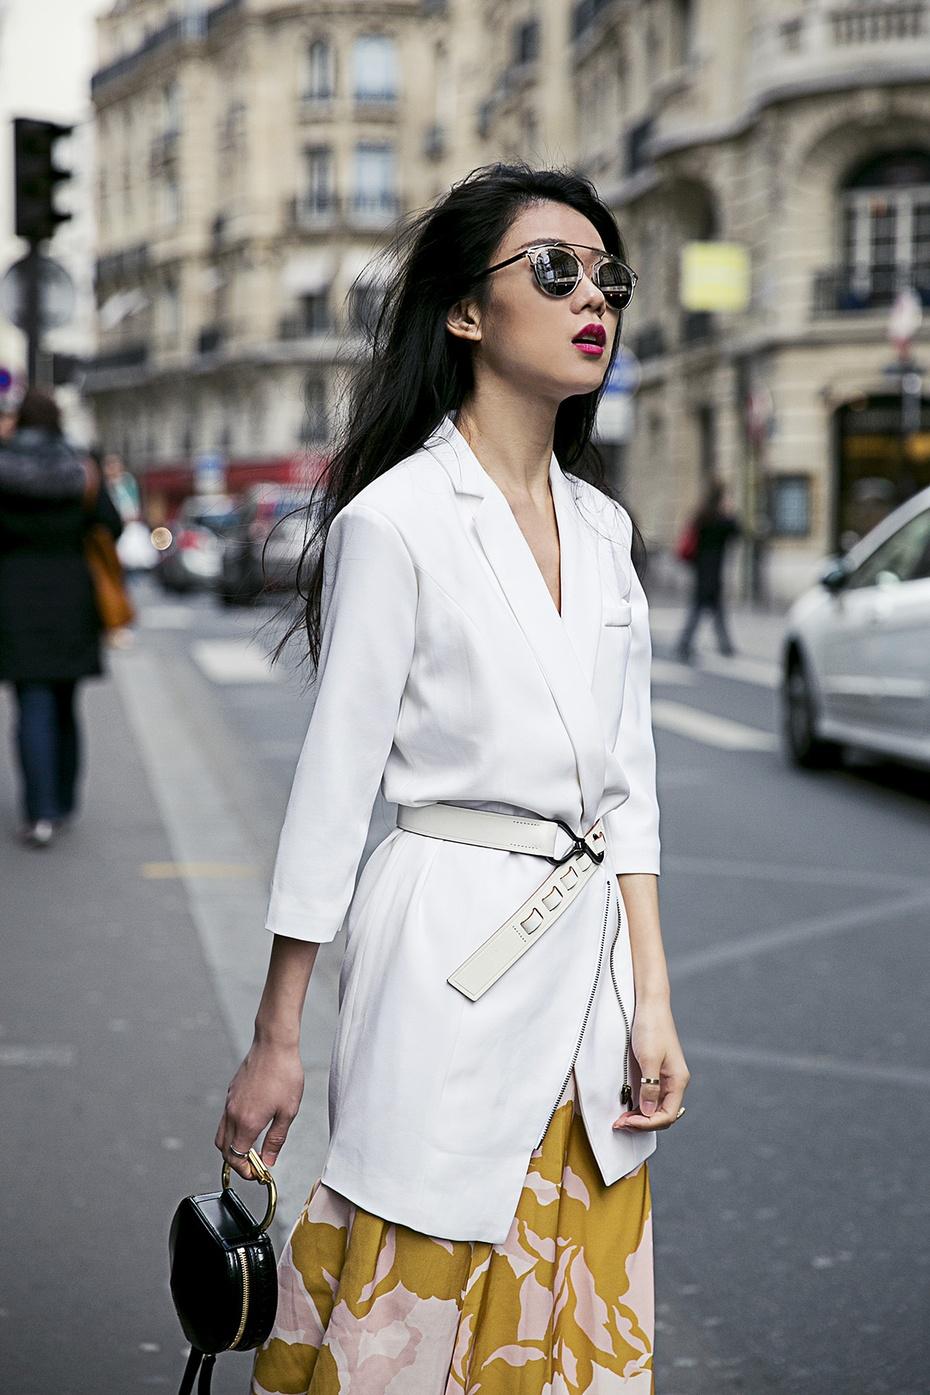 [Ava搭配日记]巴黎,优雅而精致的生活情怀 - AvaFoo - Avas Fashion Blog